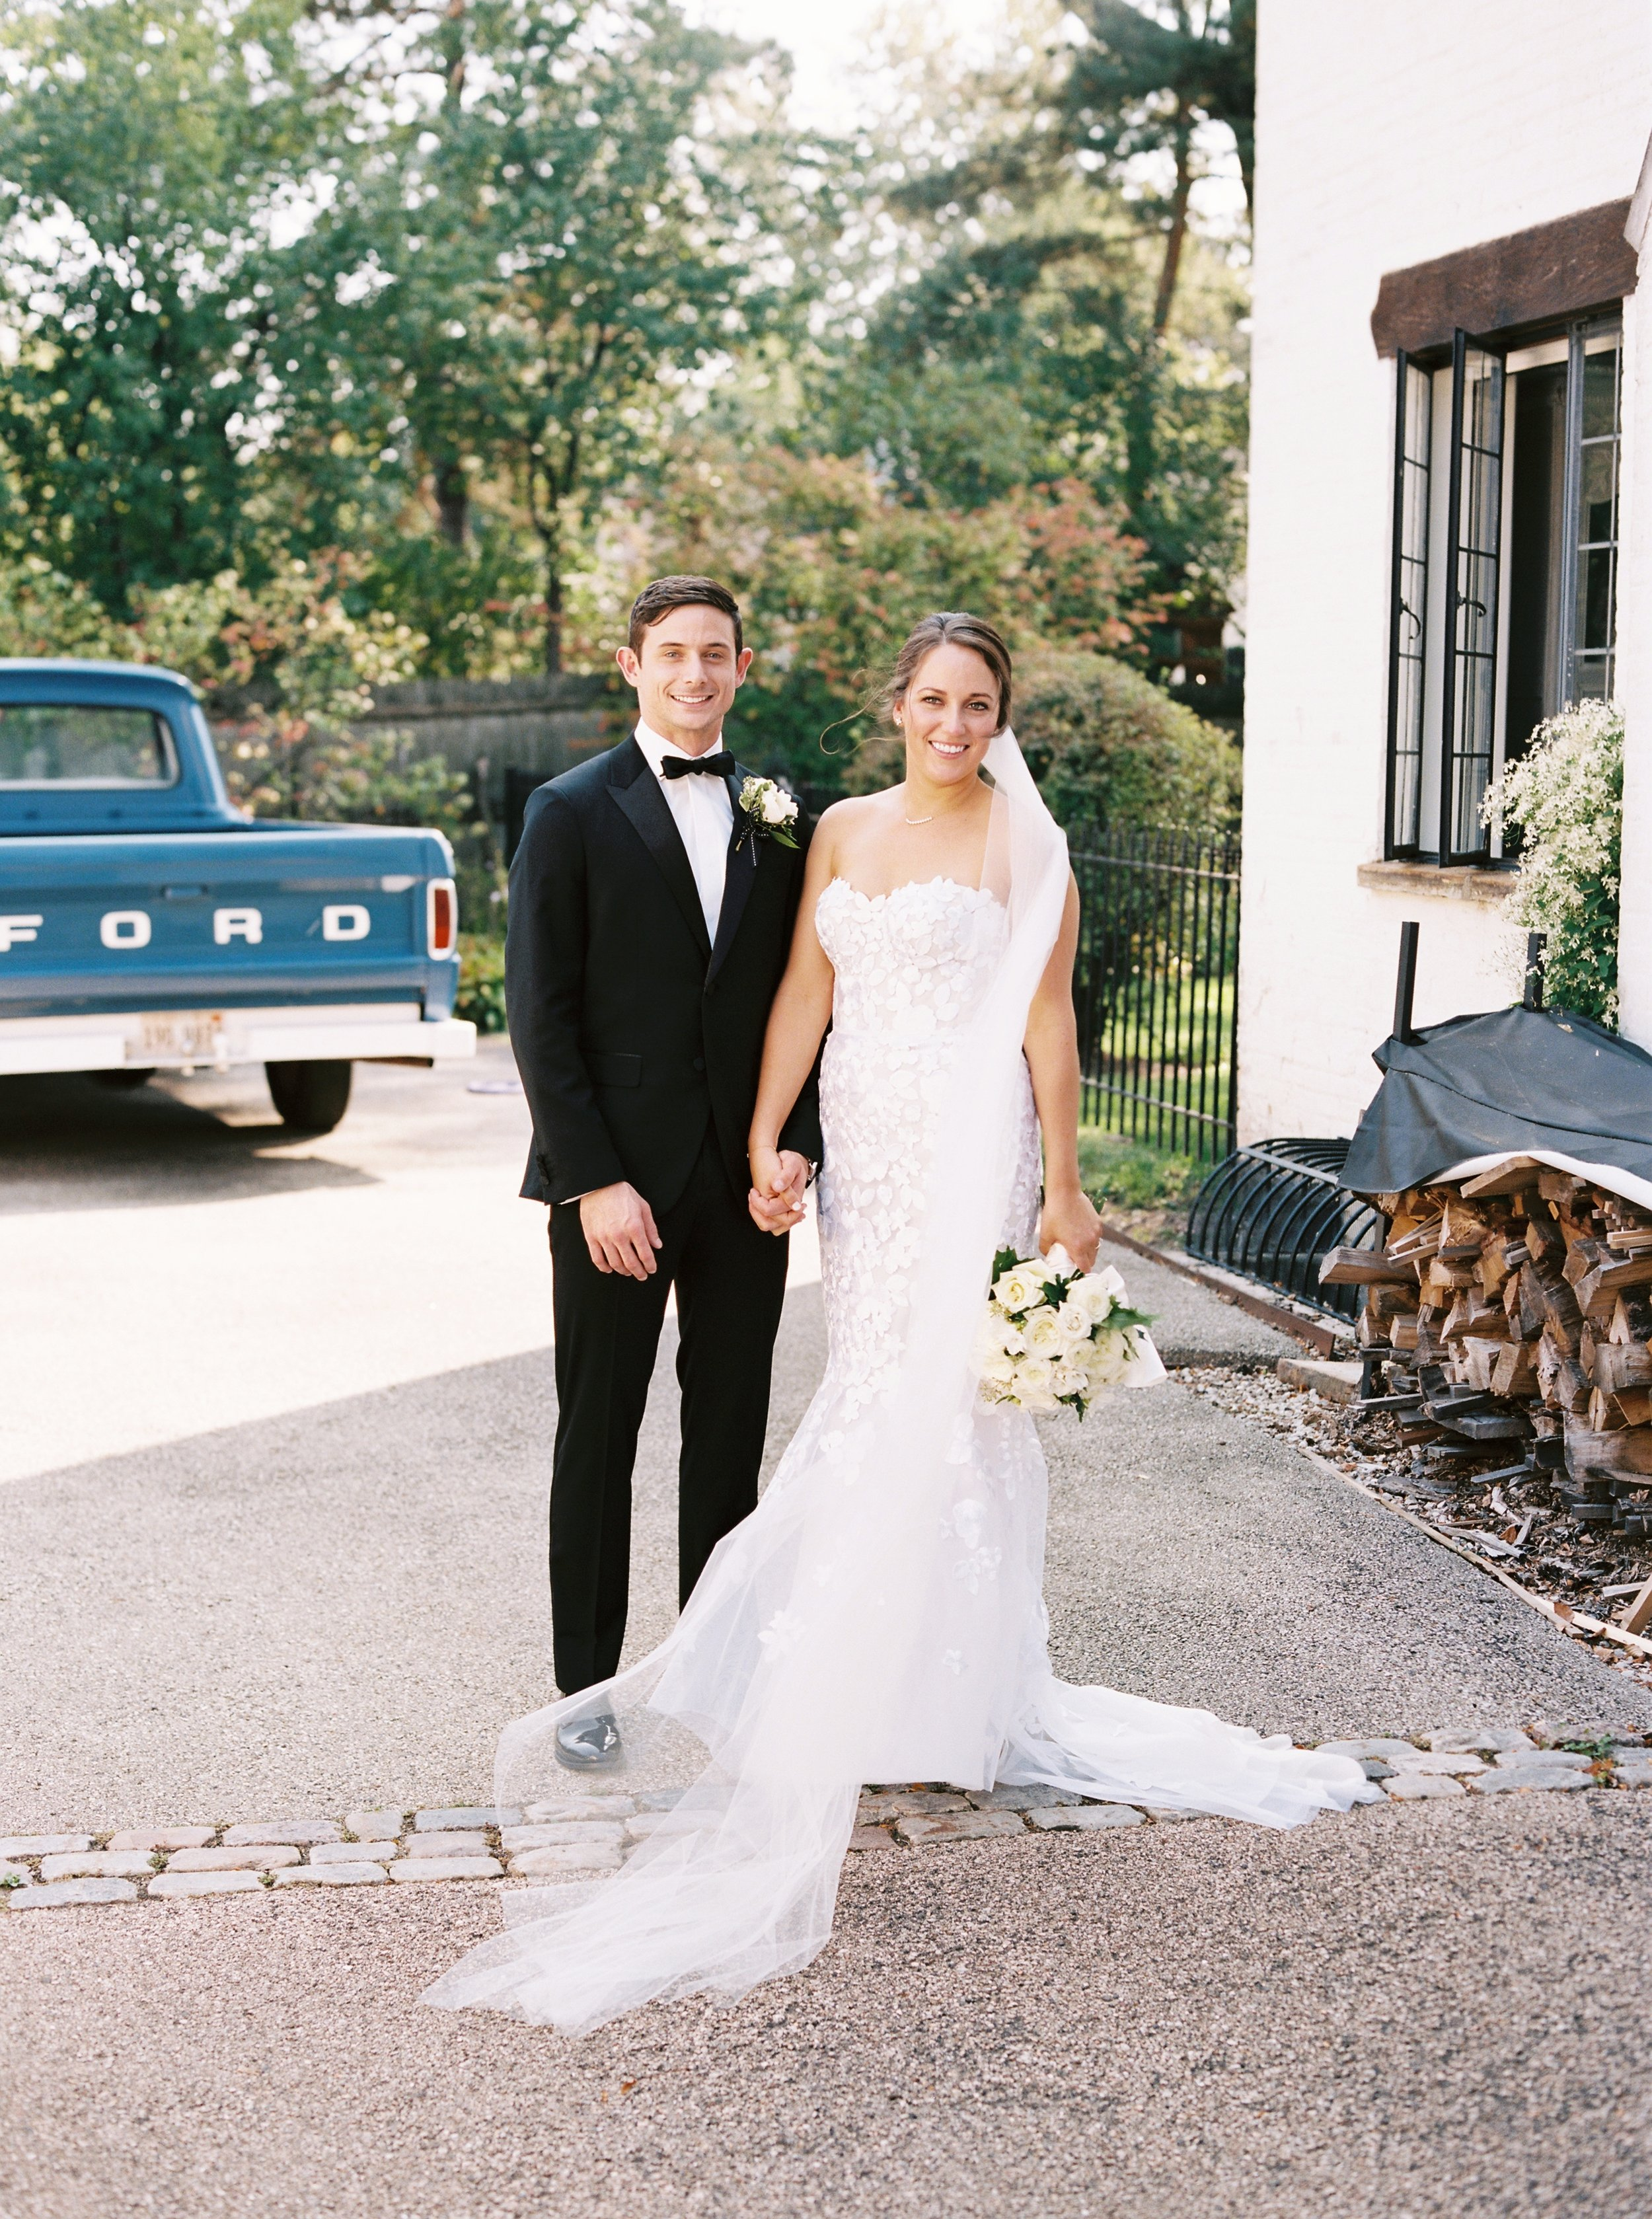 Kyle John l Fine Art Wedding Photography l Chicago, Copenhagen, California, New York, Destination l Blog l Kate and Michael_Winnetka_15